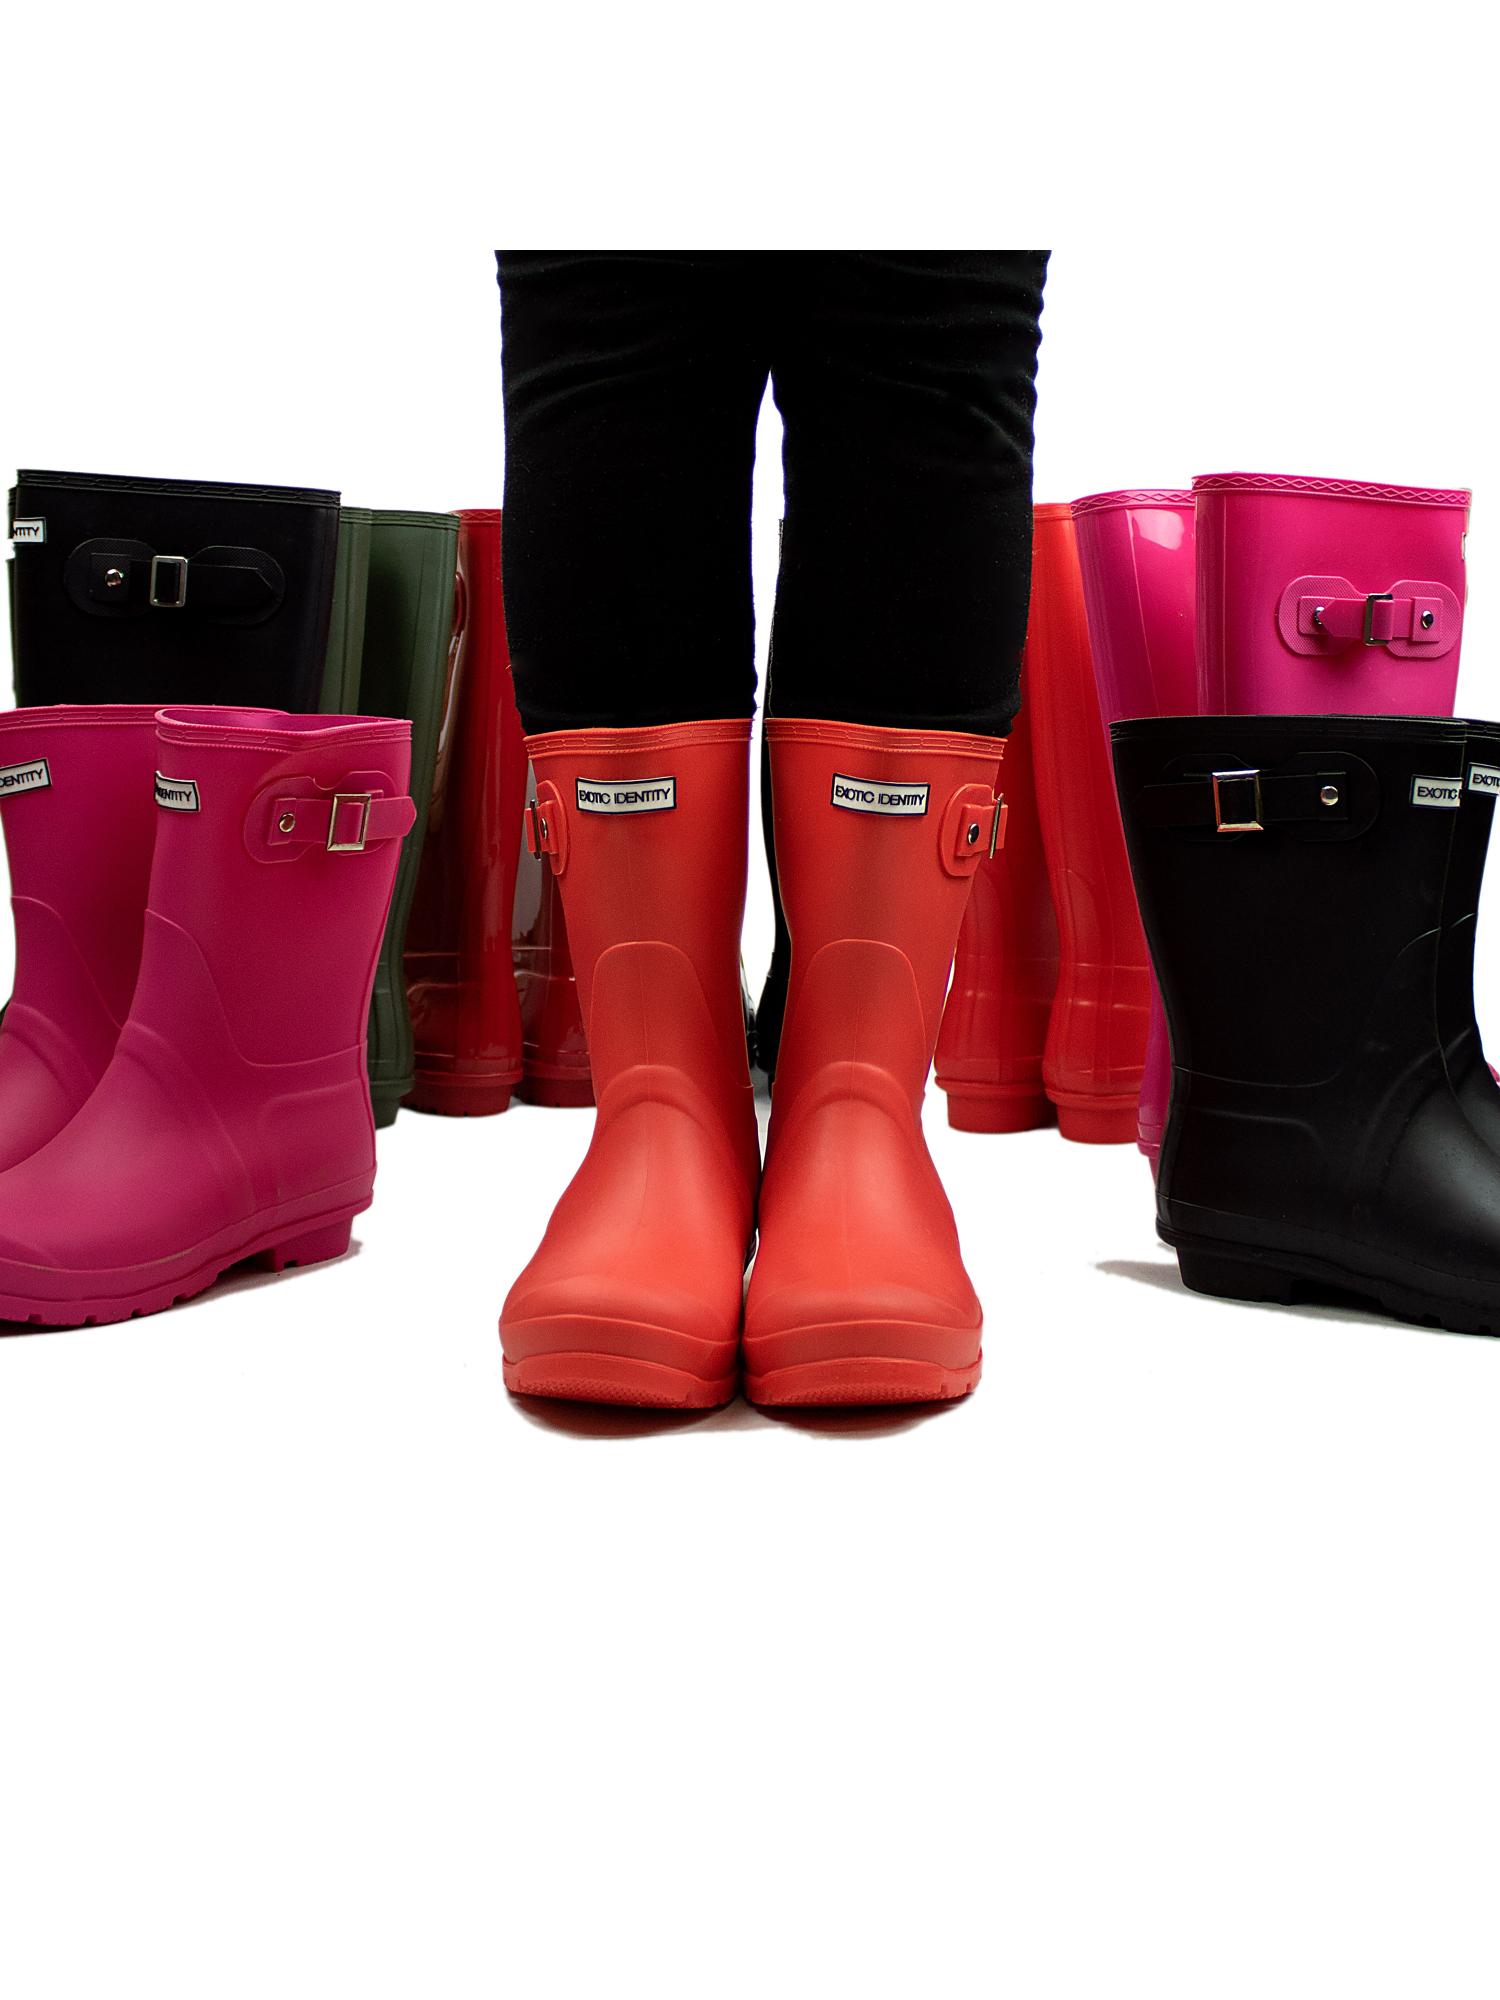 Exotic-Identity-Short-Rain-Boots-Non-Slip-100-Waterproof-for-Women thumbnail 16